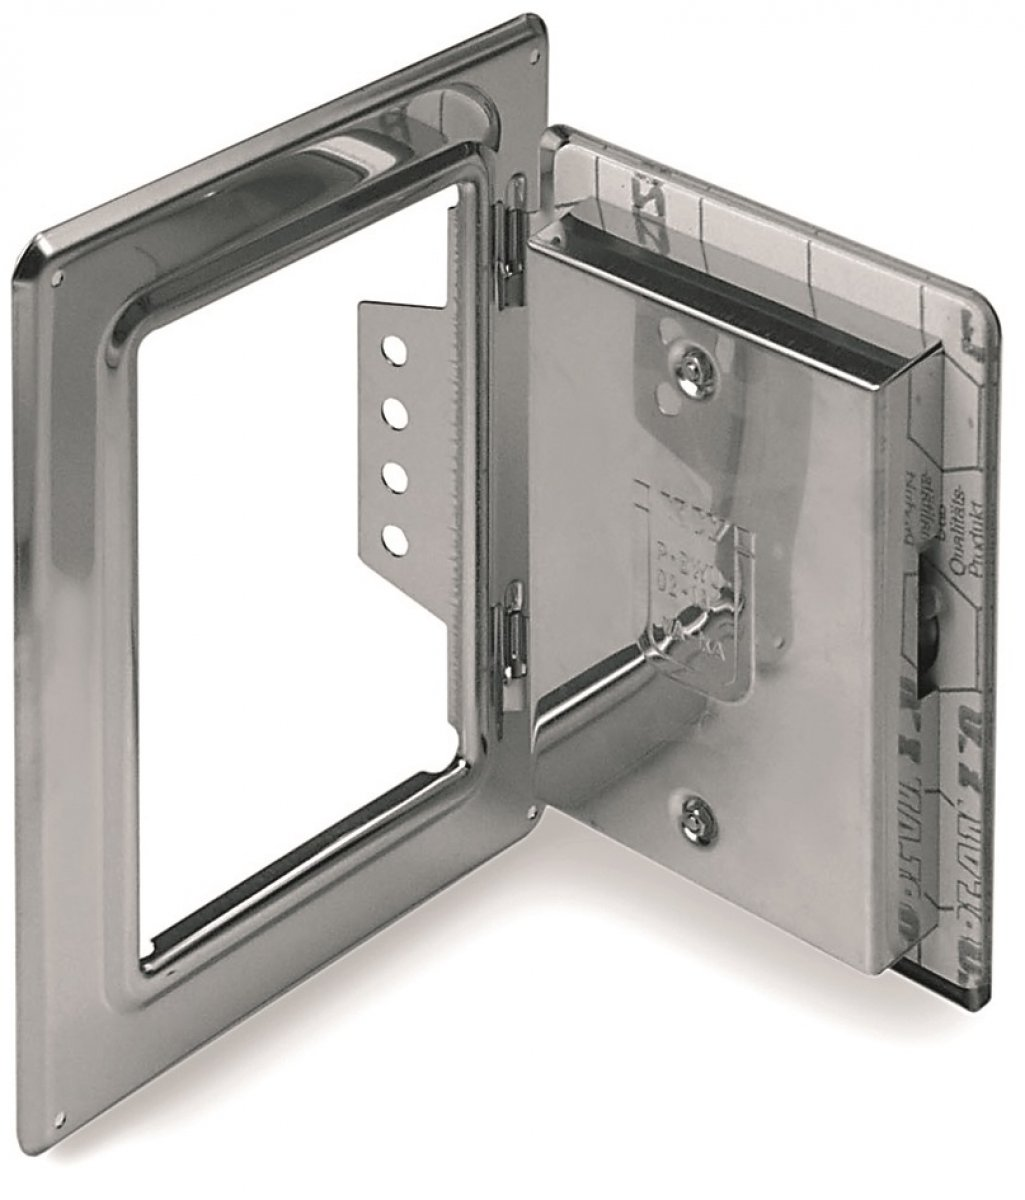 Schoorsteendeur van roestvrijstaal 300 mm x 150 mm met 60 mm kliksluiting – enkelwandig voor Technovis EW-FU